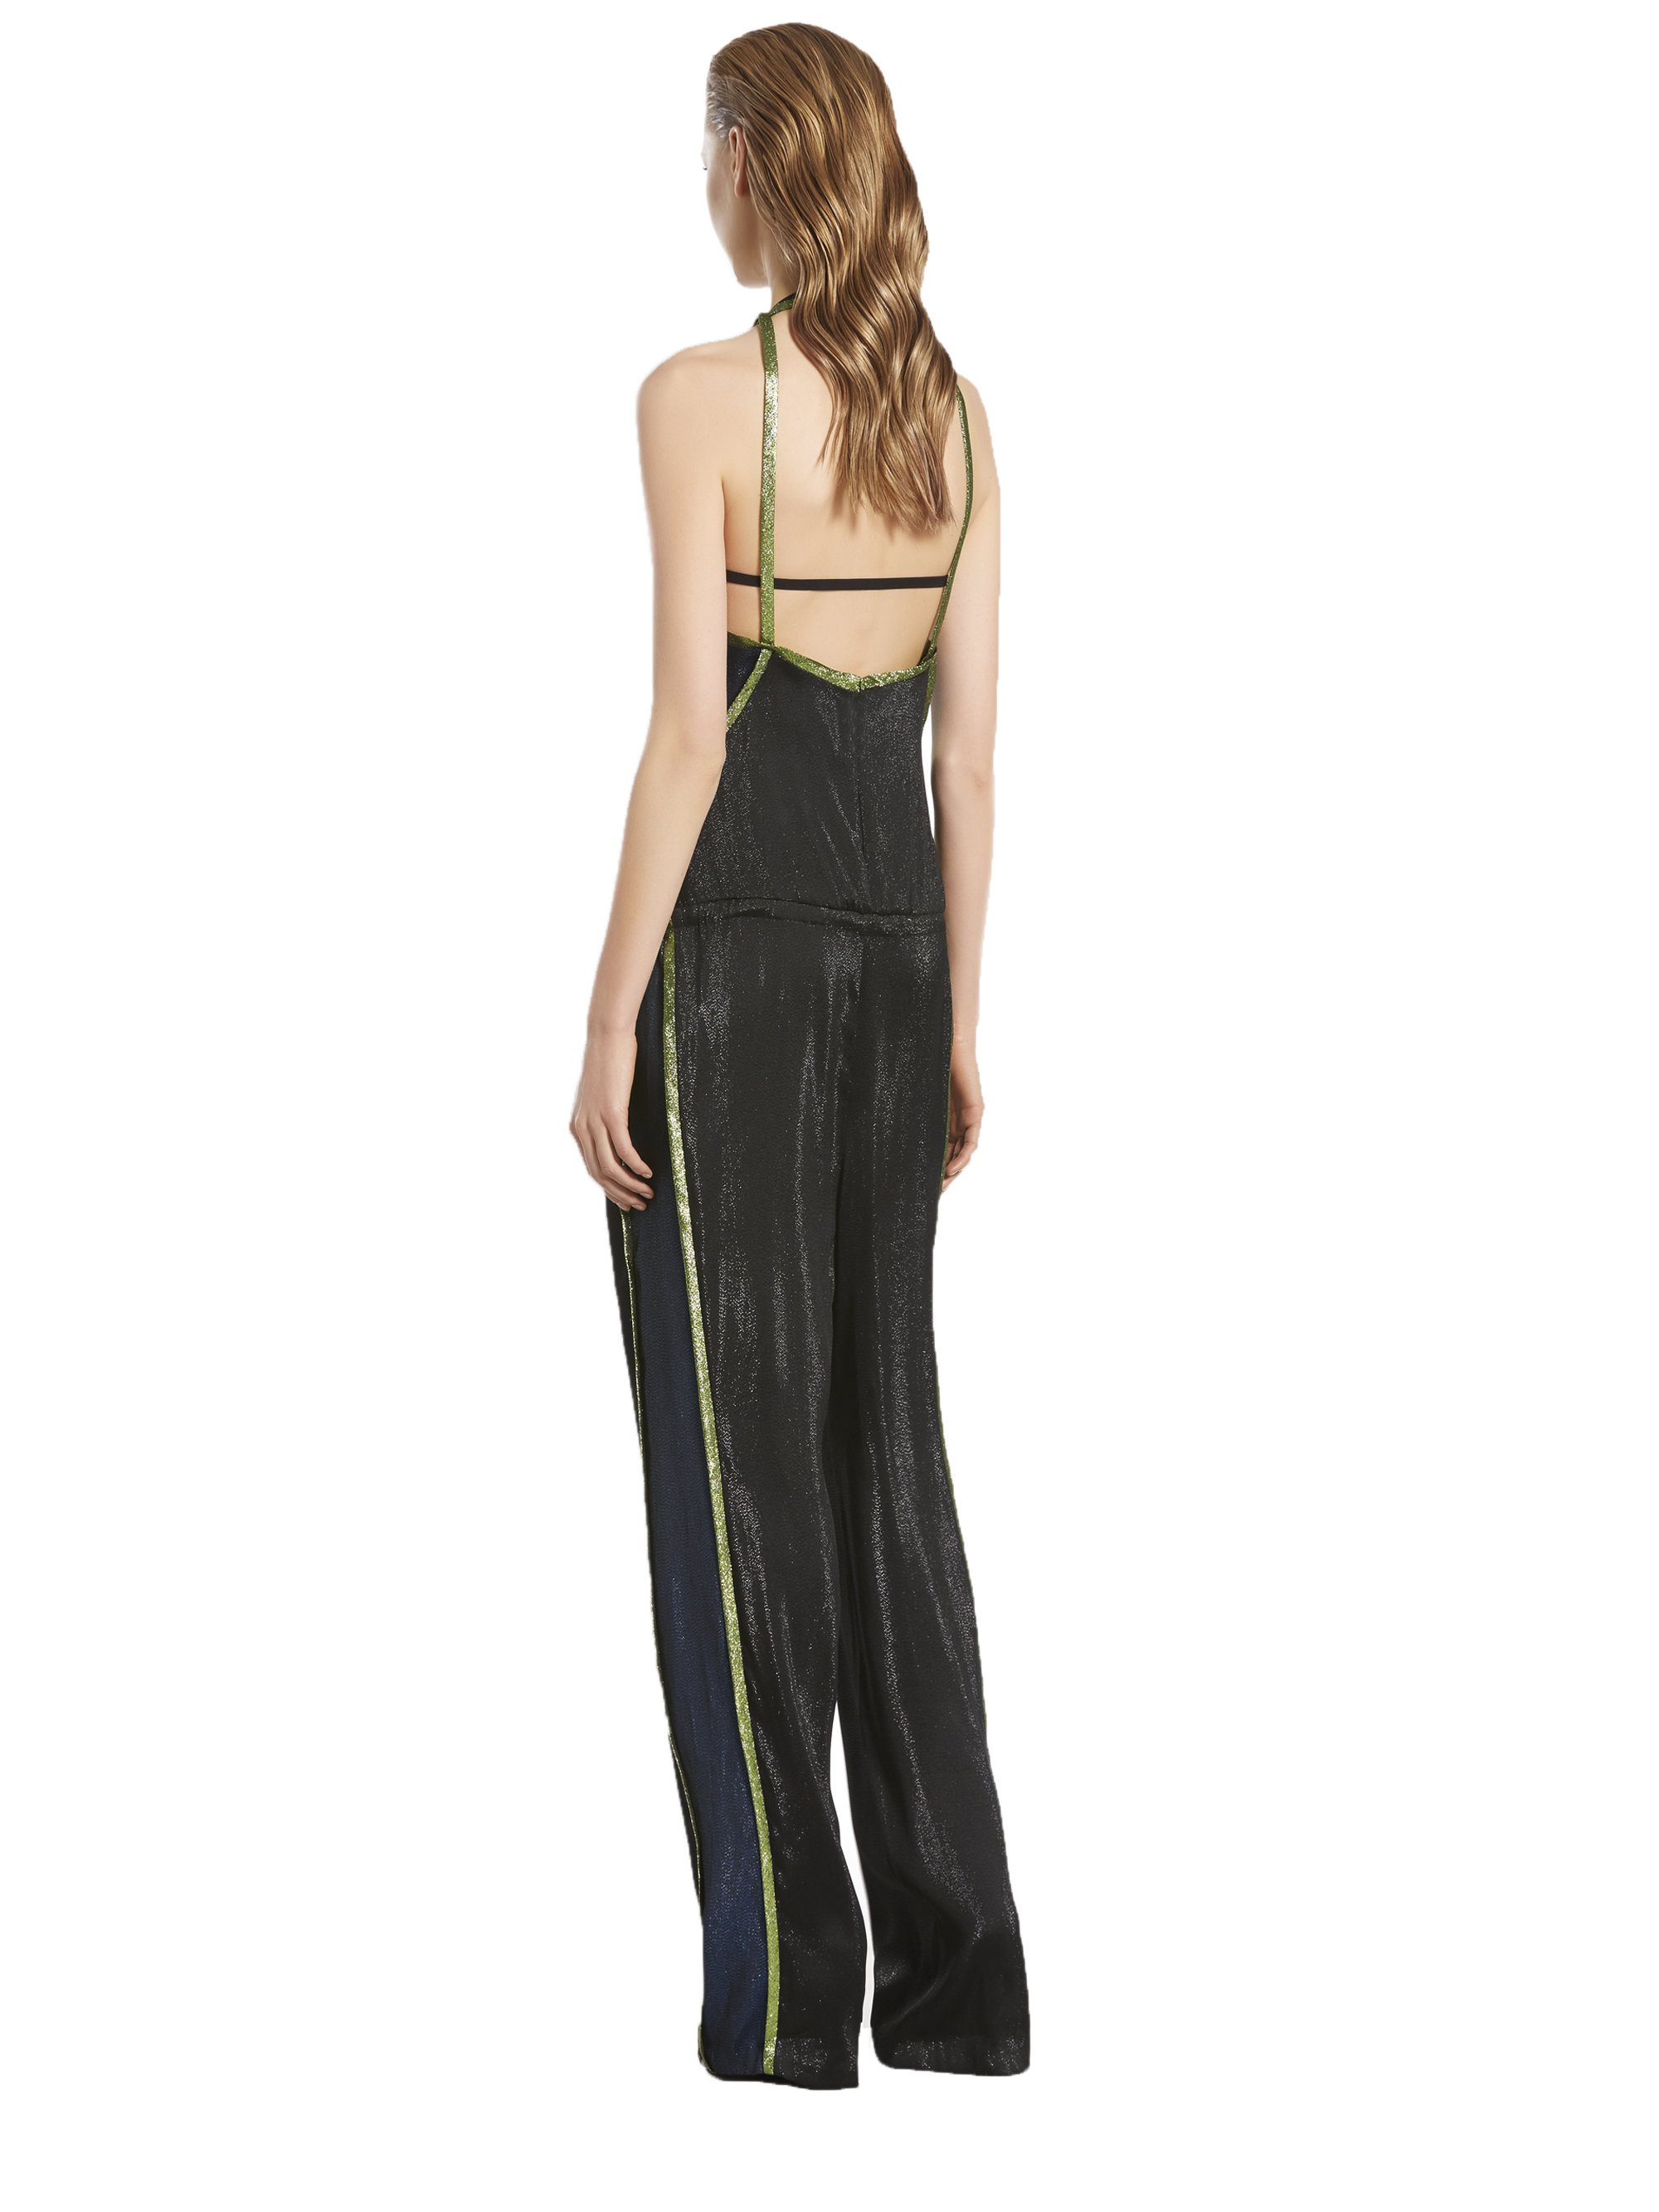 6b002df88ac Lyst - Gucci Liquid Lame Jumpsuit in Black